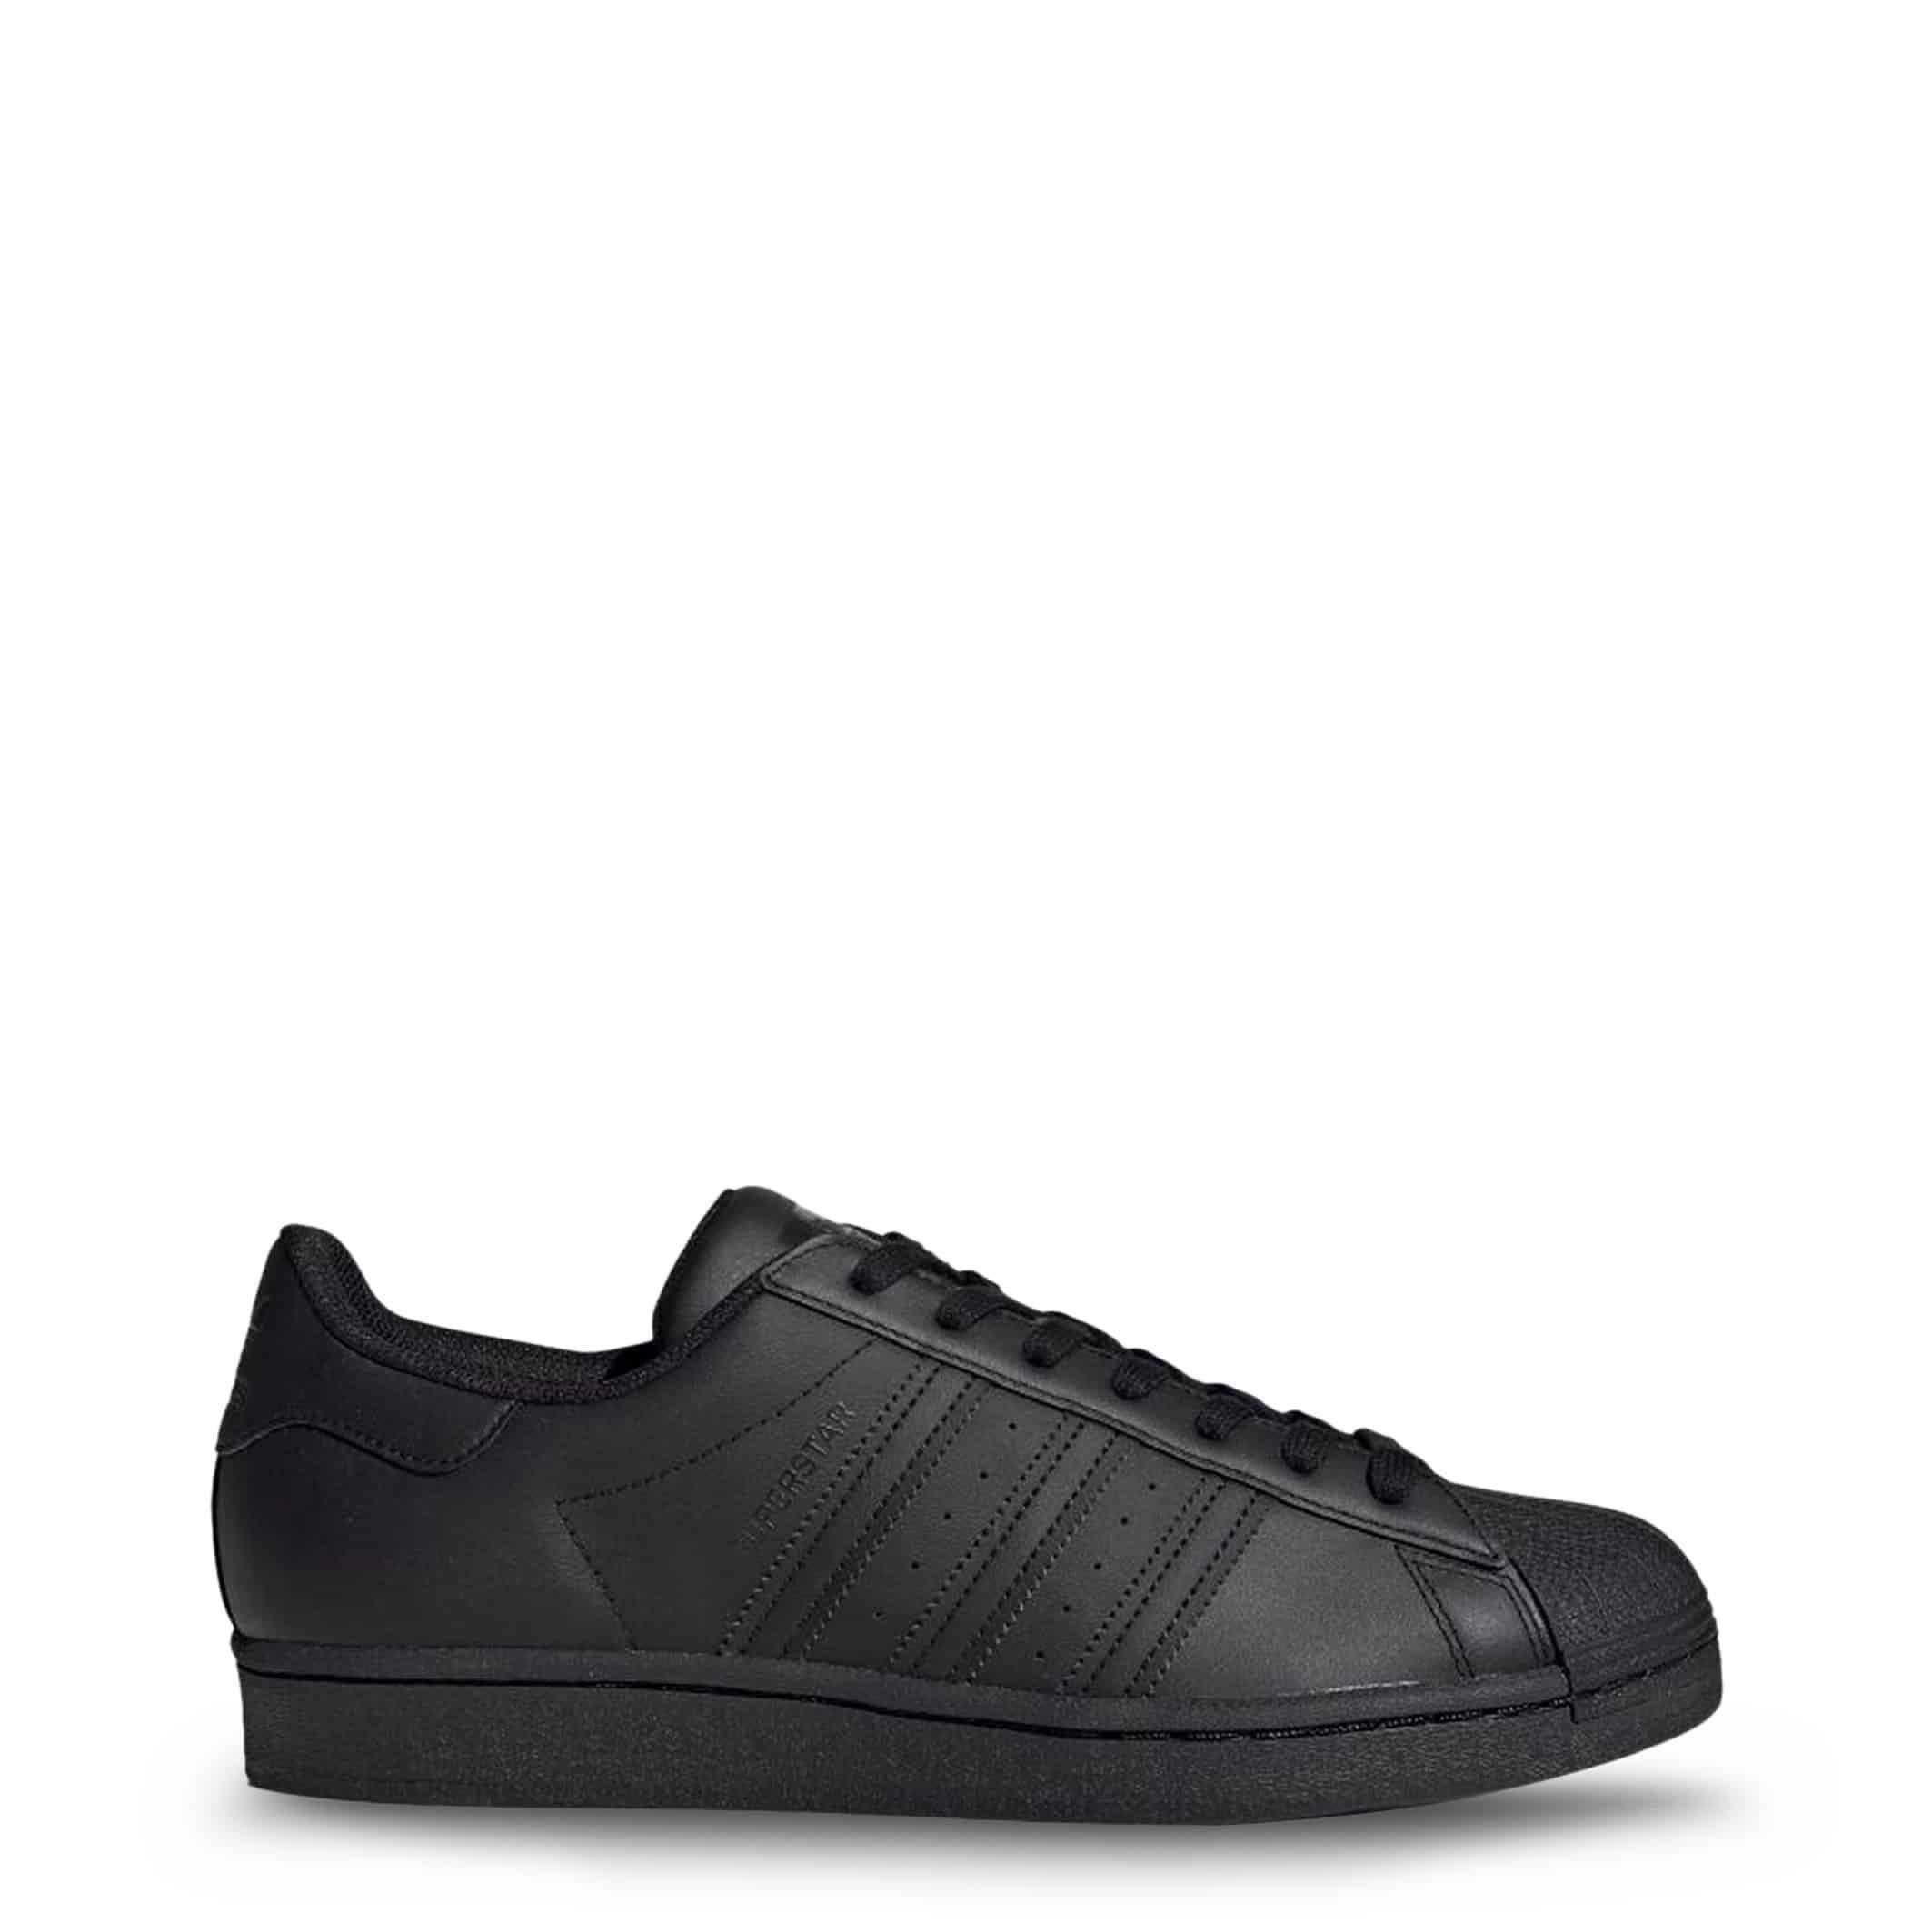 Adidas – Superstar – Zwart Designeritems.nl